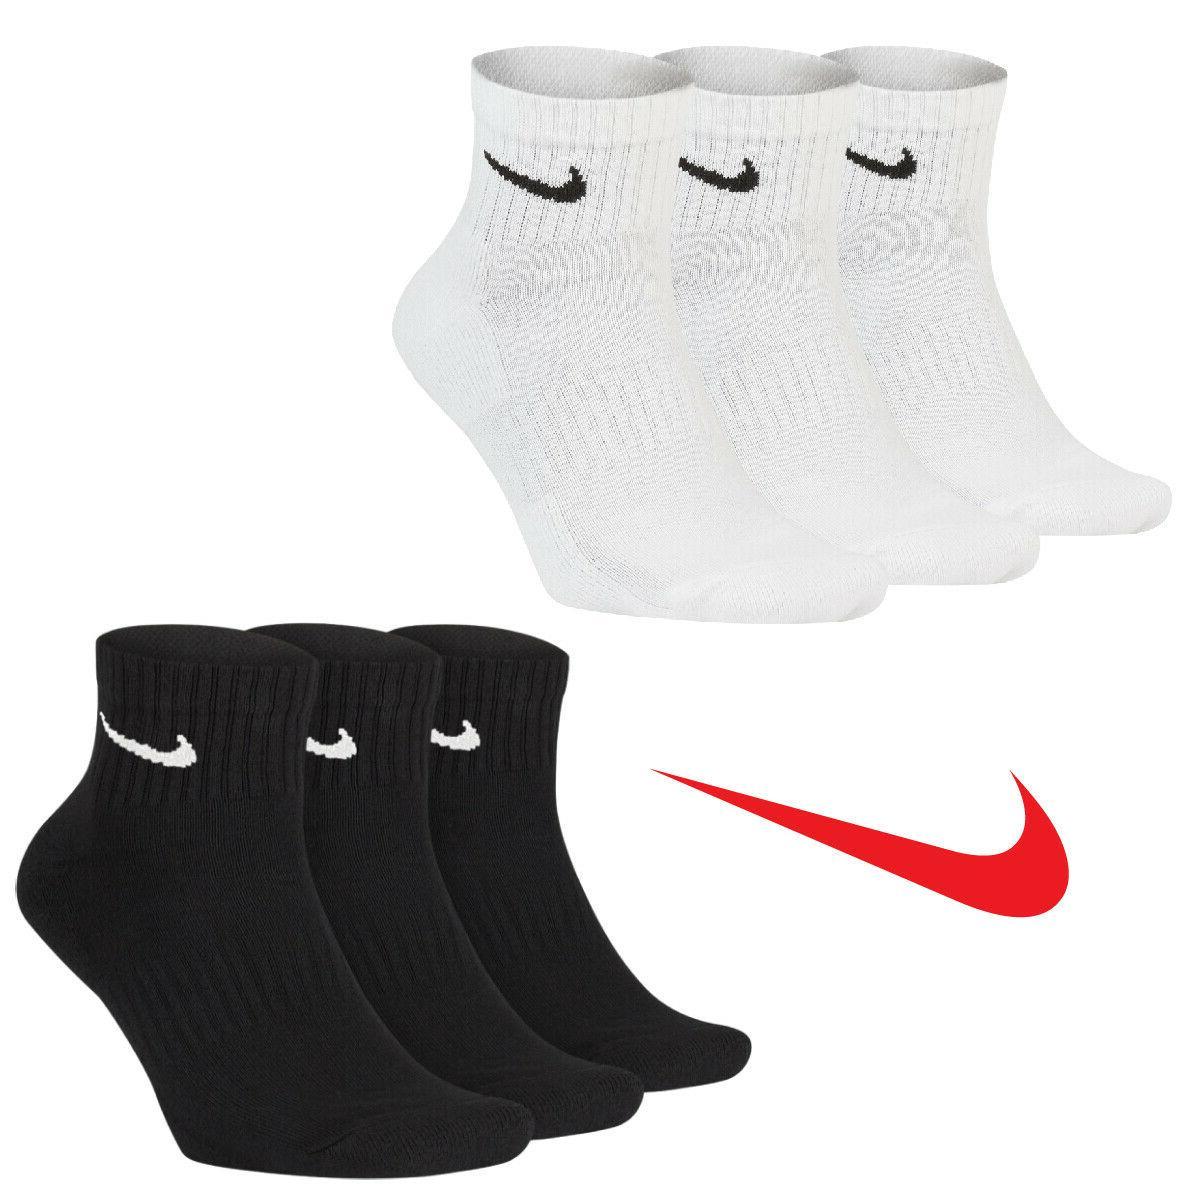 everyday quarter cushion ankle training socks 3